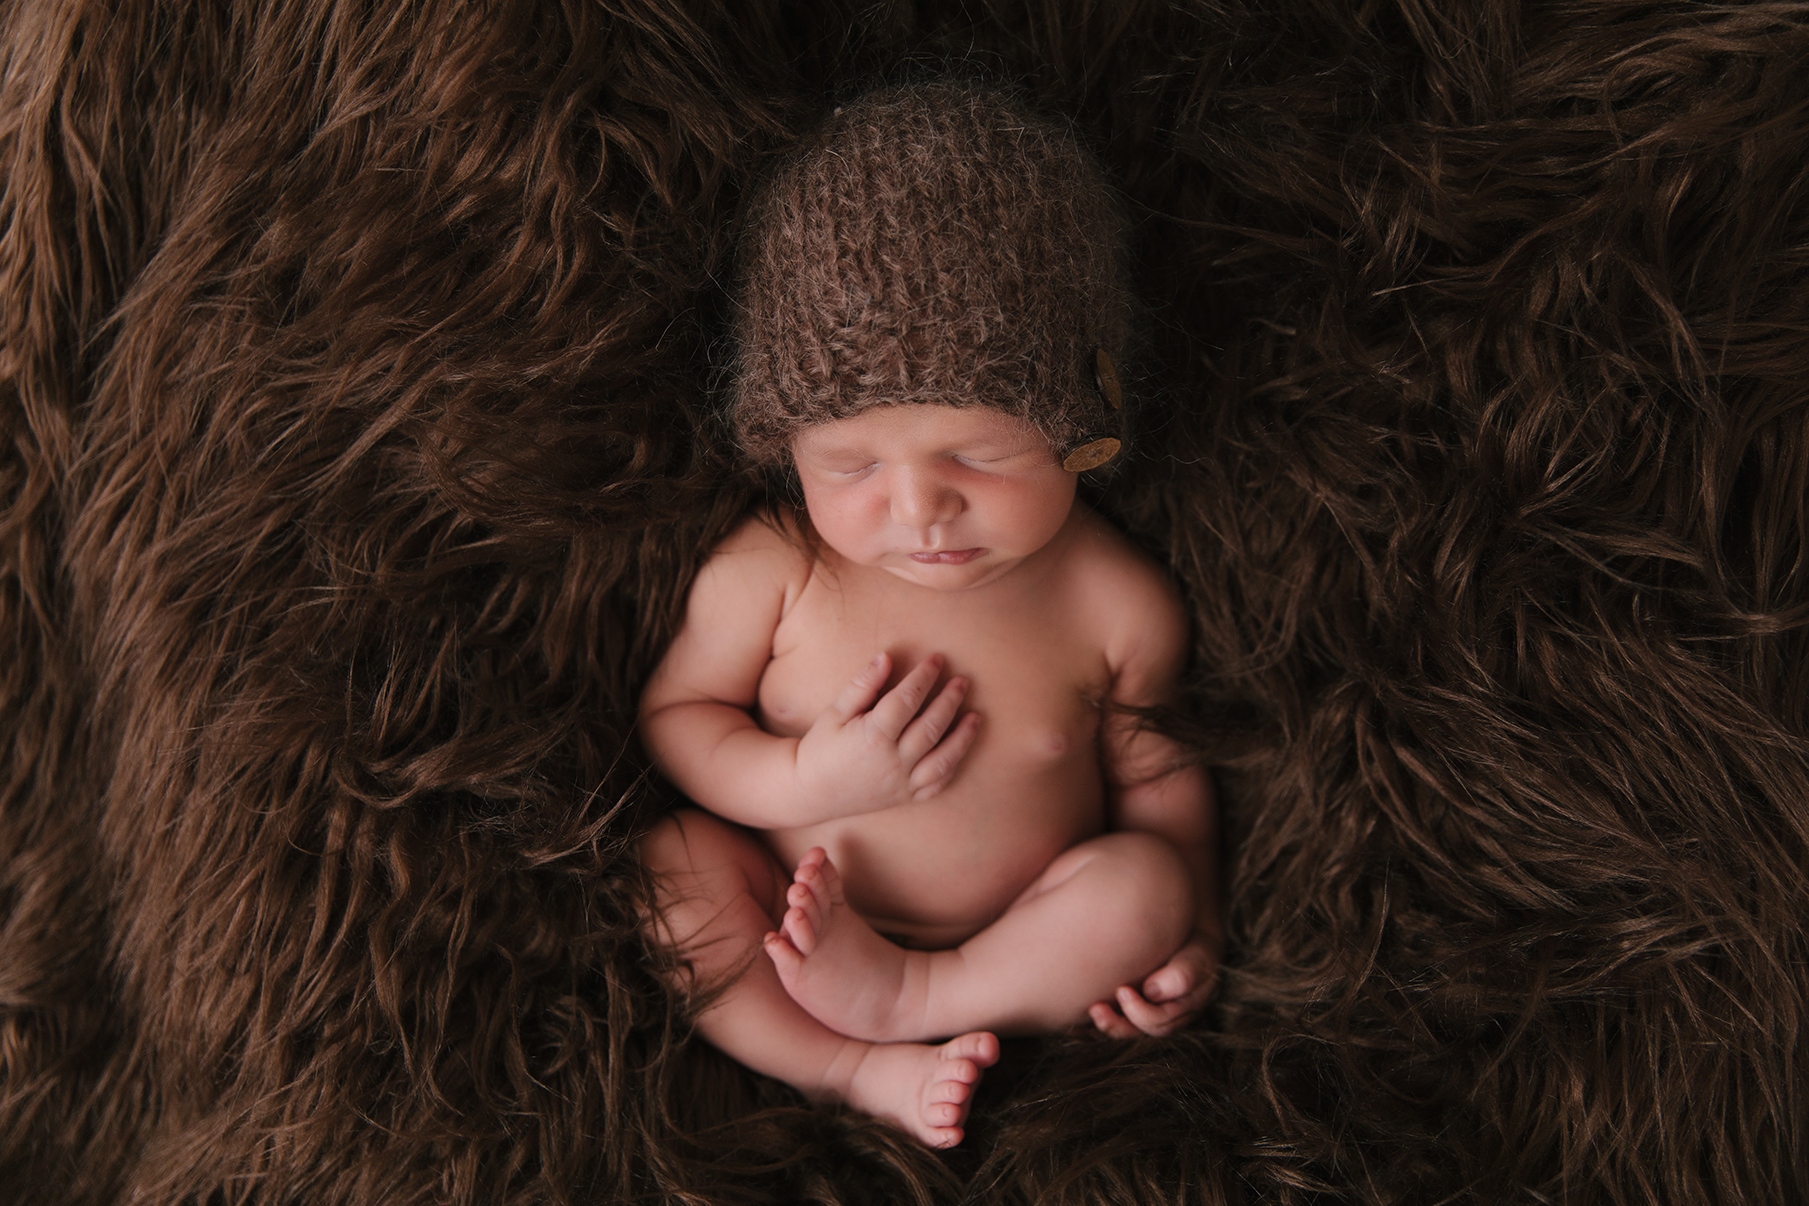 Kinsman_Ohio_Baby_Boy_Newborn_photography_by_Christie_Leigh_Photo_in_Cortland_Ohio-008.jpg